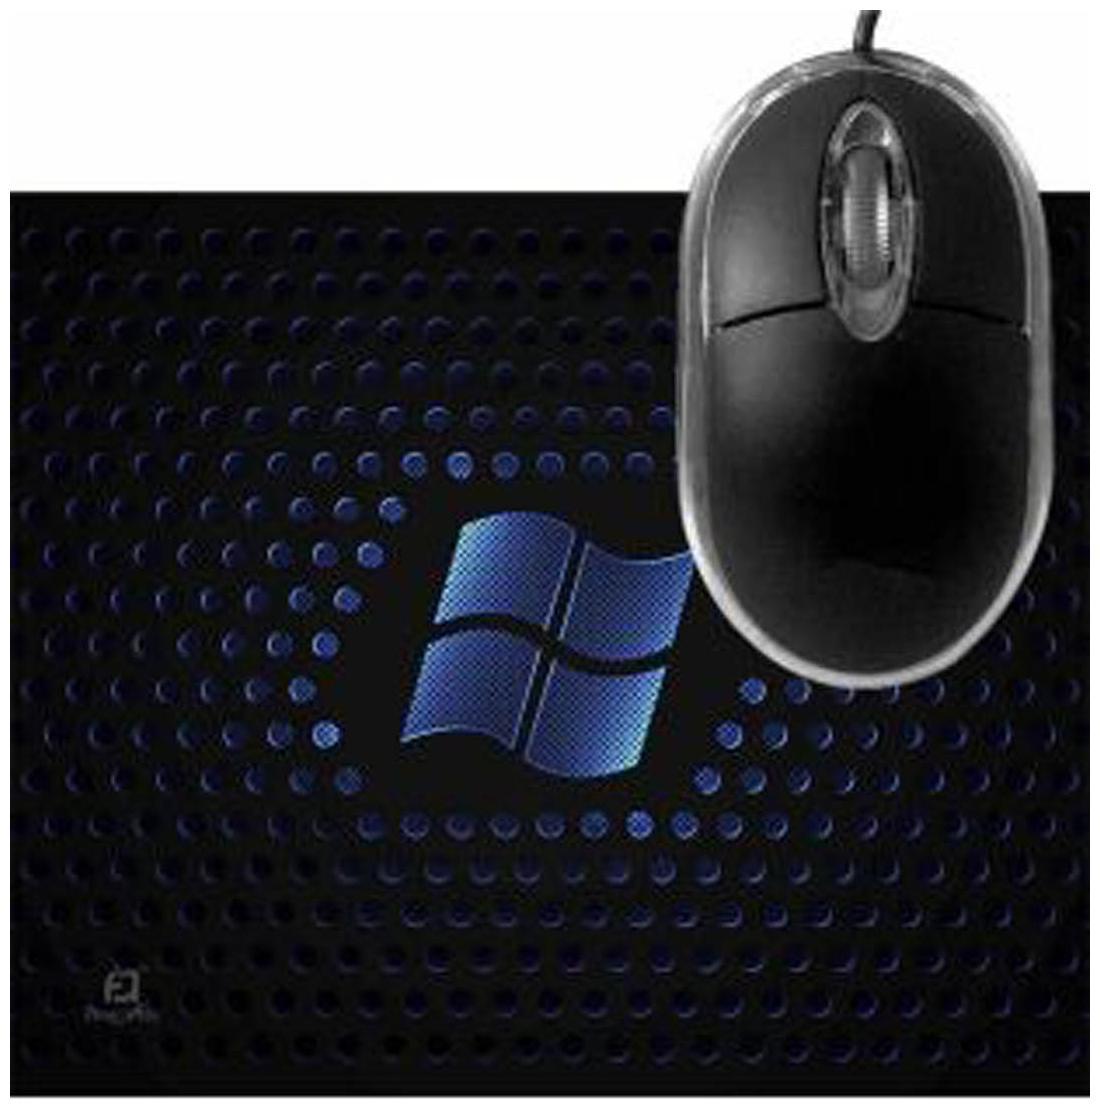 https://assetscdn1.paytm.com/images/catalog/product/G/GA/GAMFINEARTS-WINFINE300796408F9F1/1563524664719_0.jpg